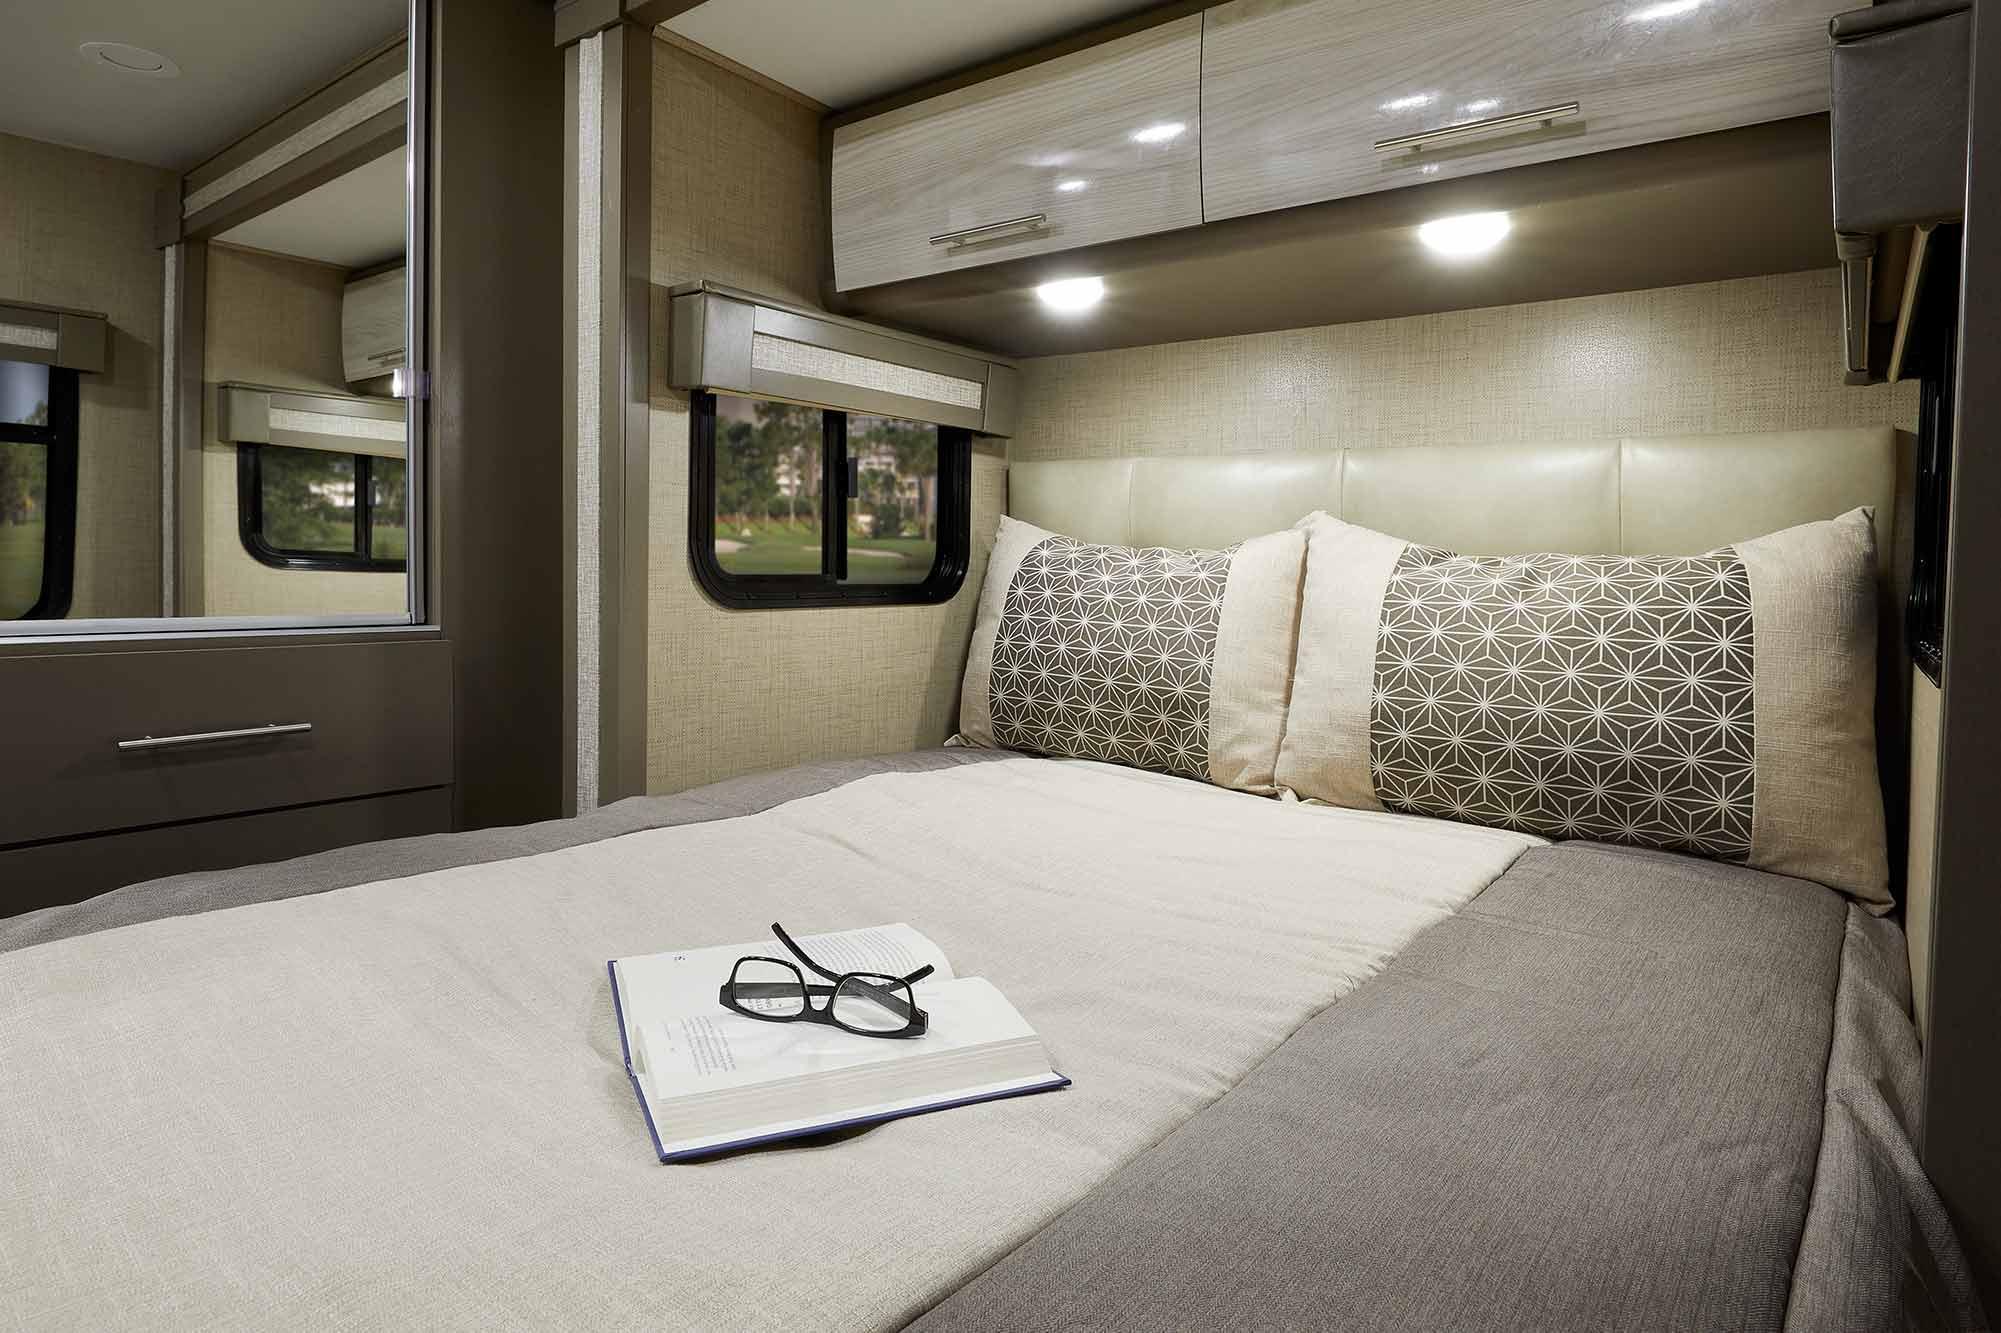 Groovy Compass Ruv Class B Motorhomes Thor Motor Coach Interior Design Ideas Gentotryabchikinfo